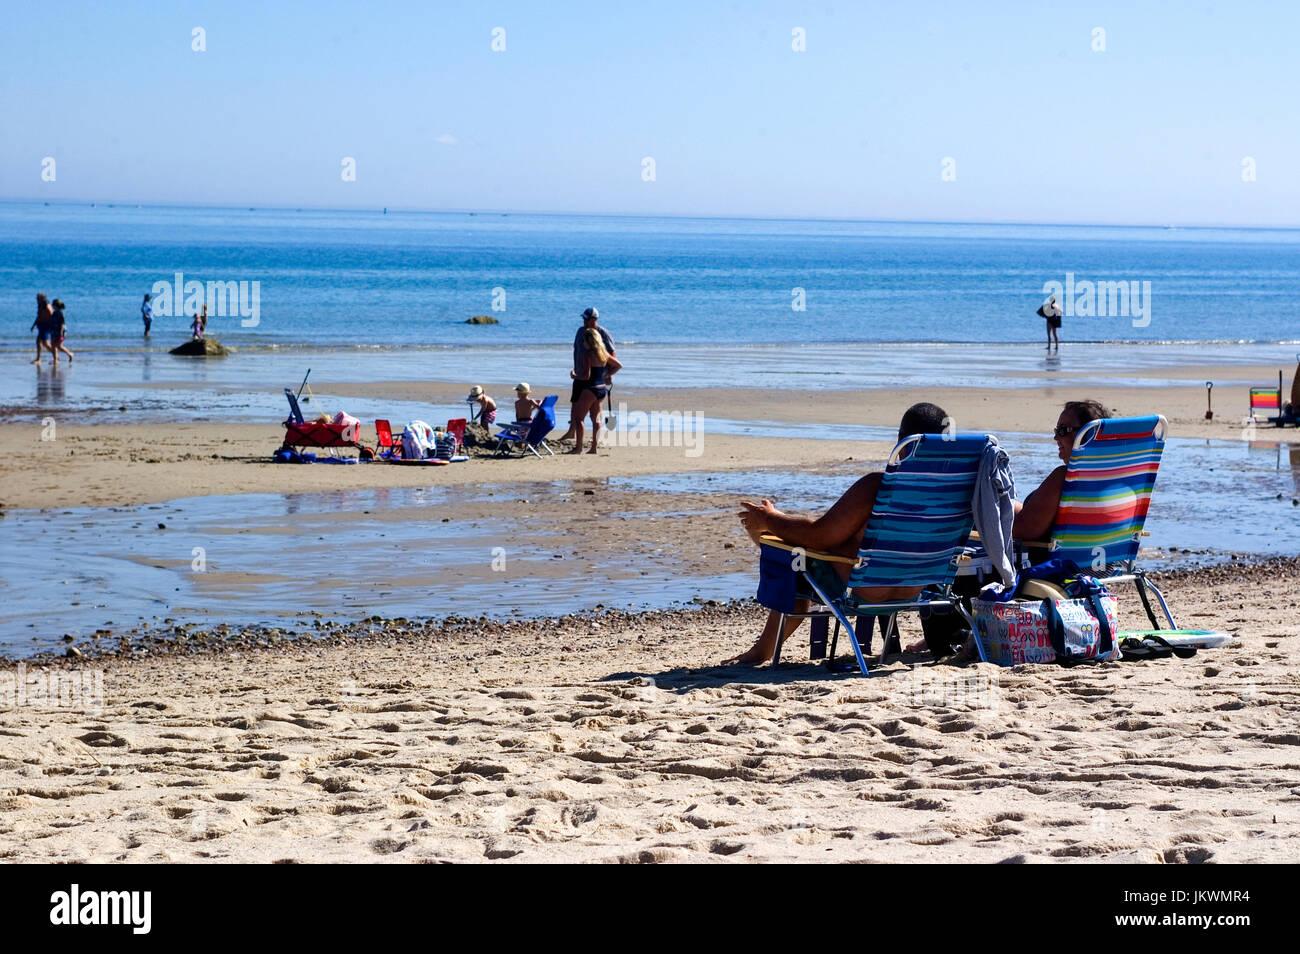 Mid morning on Howe's Beach - Dennis, Massachusetts on Cape Cod - Stock Image